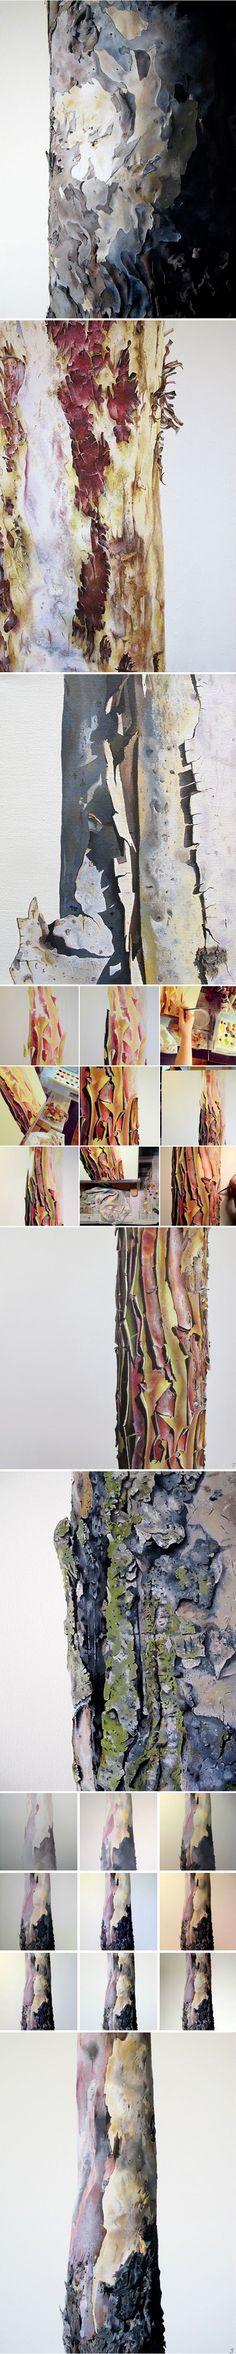 PAINTINGS! by jodi wiley <3